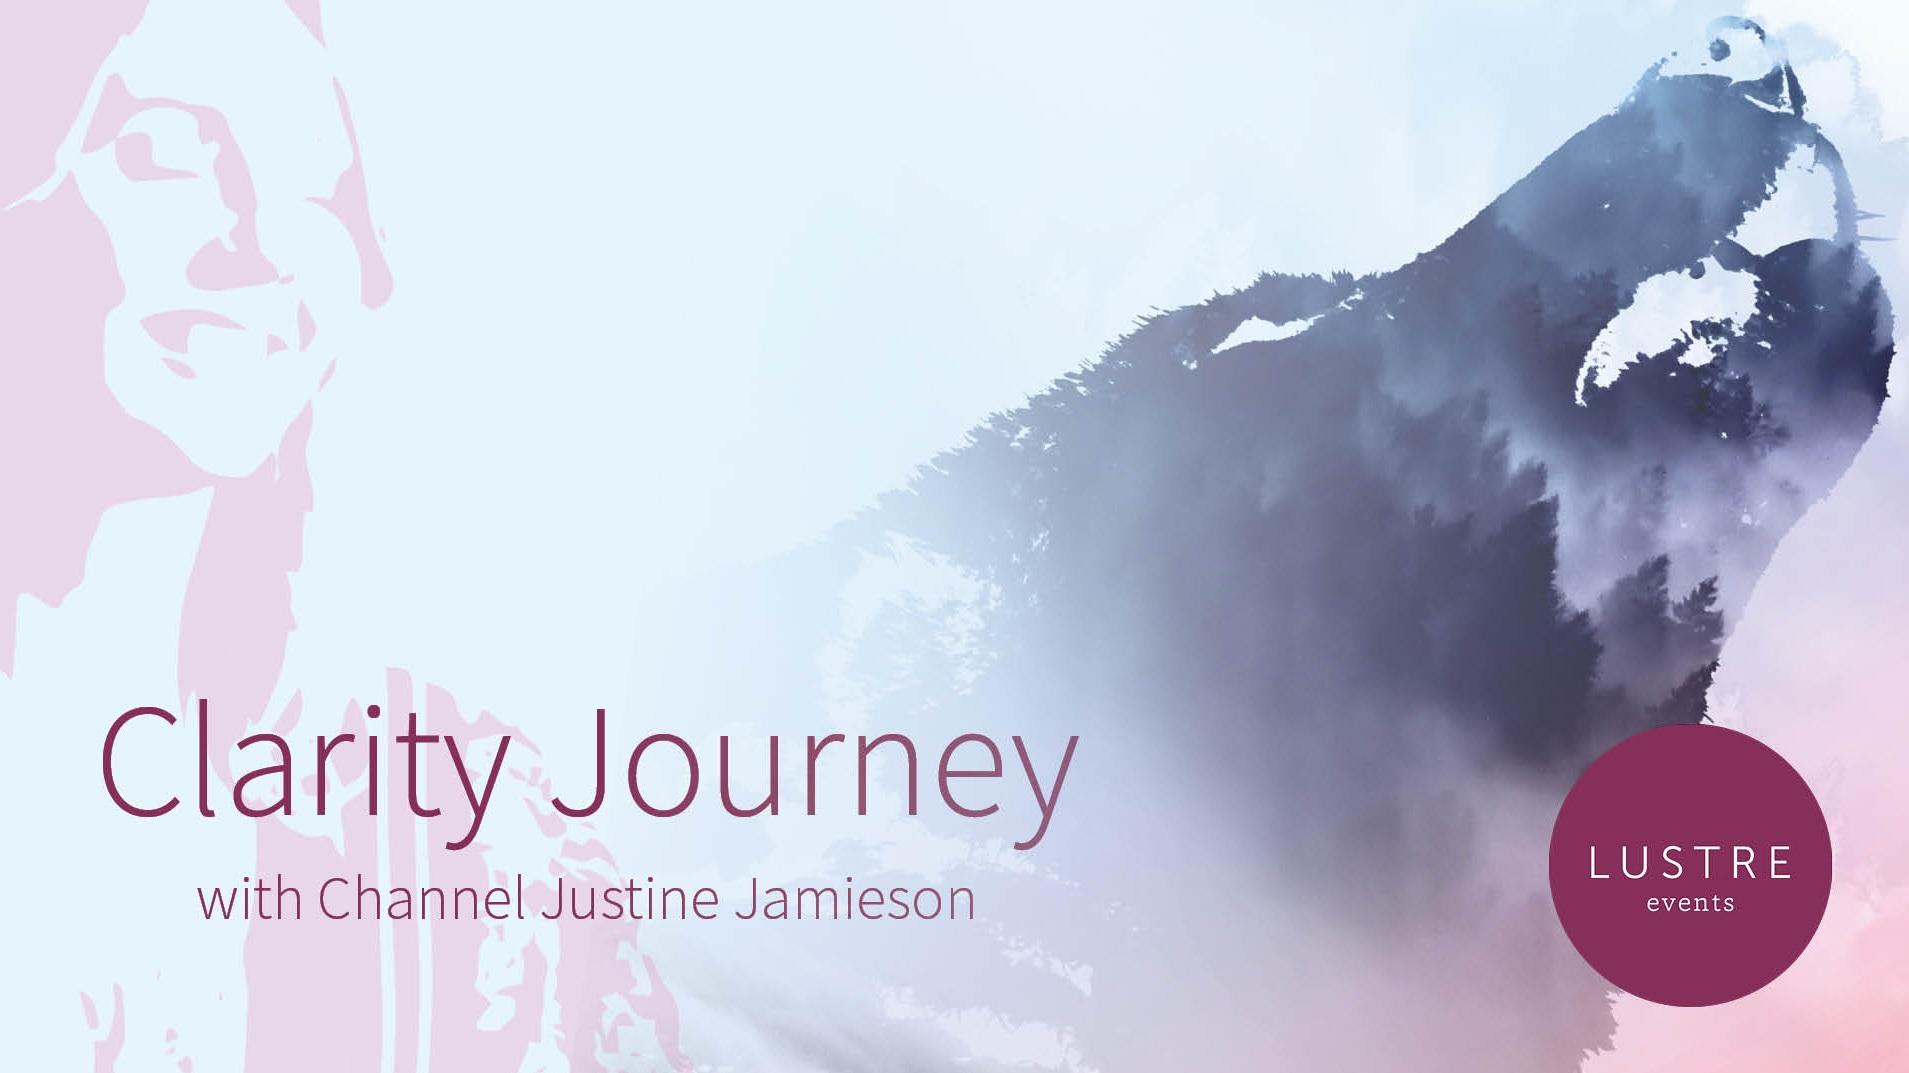 clarity+journey+event+banner.jpg